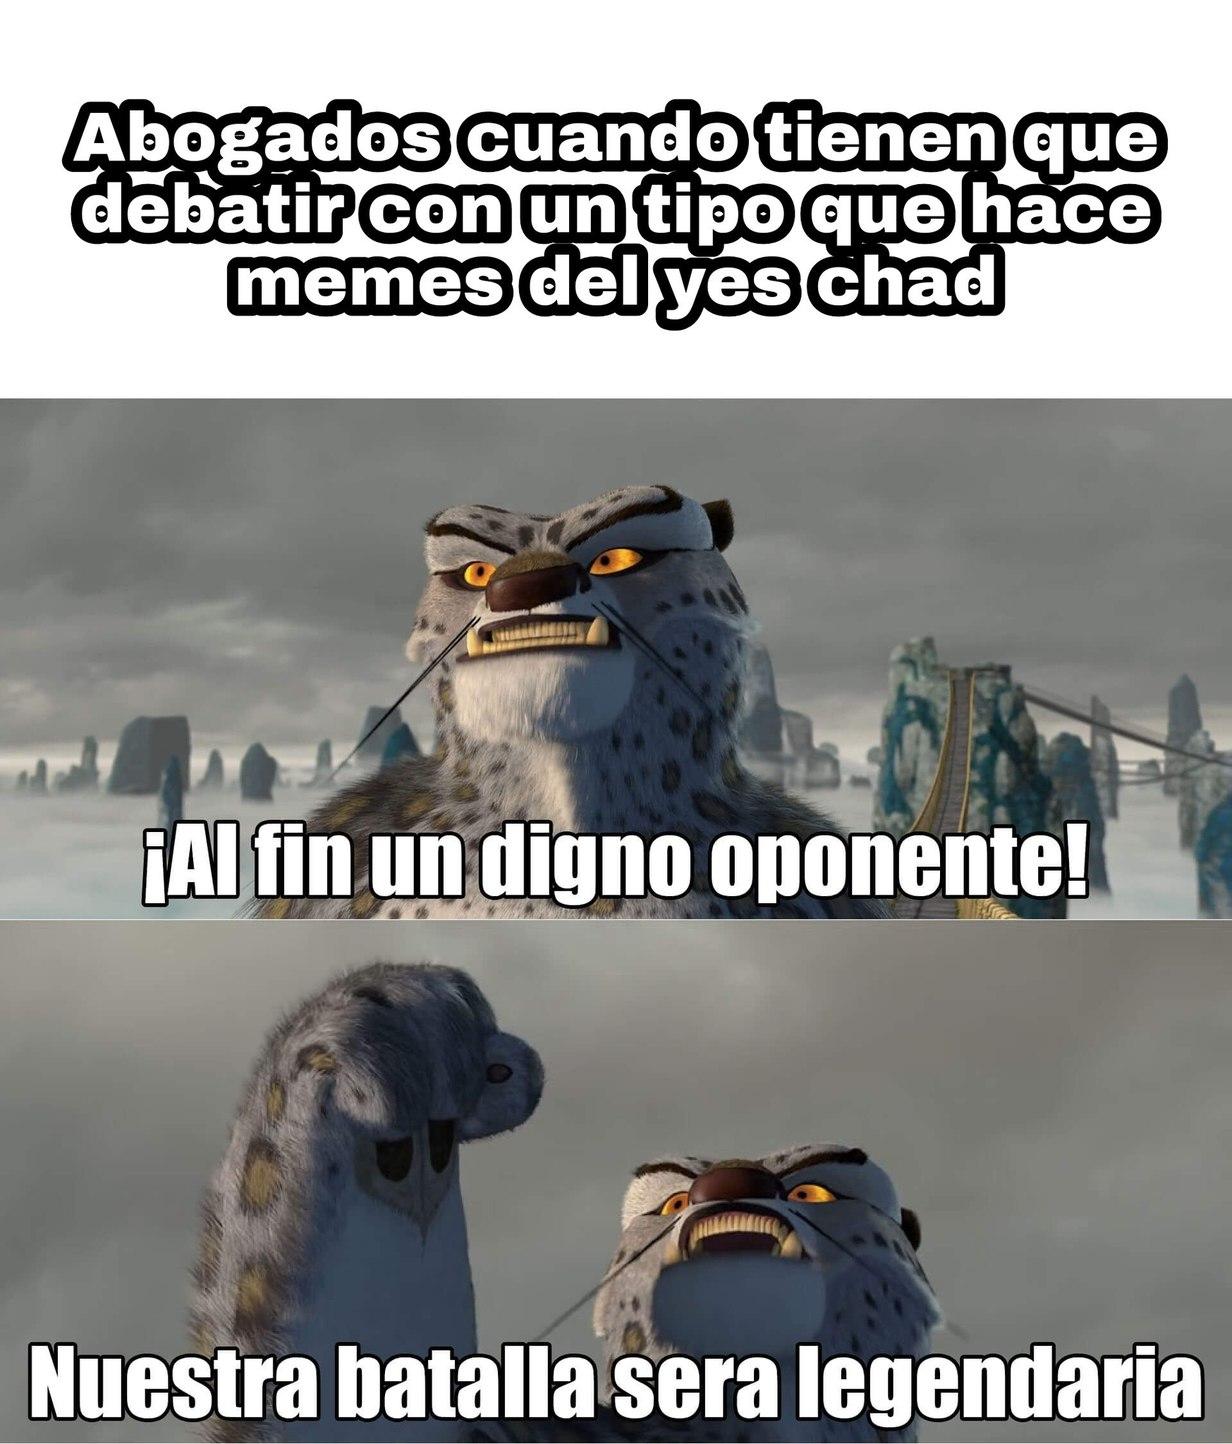 Odio ese meme